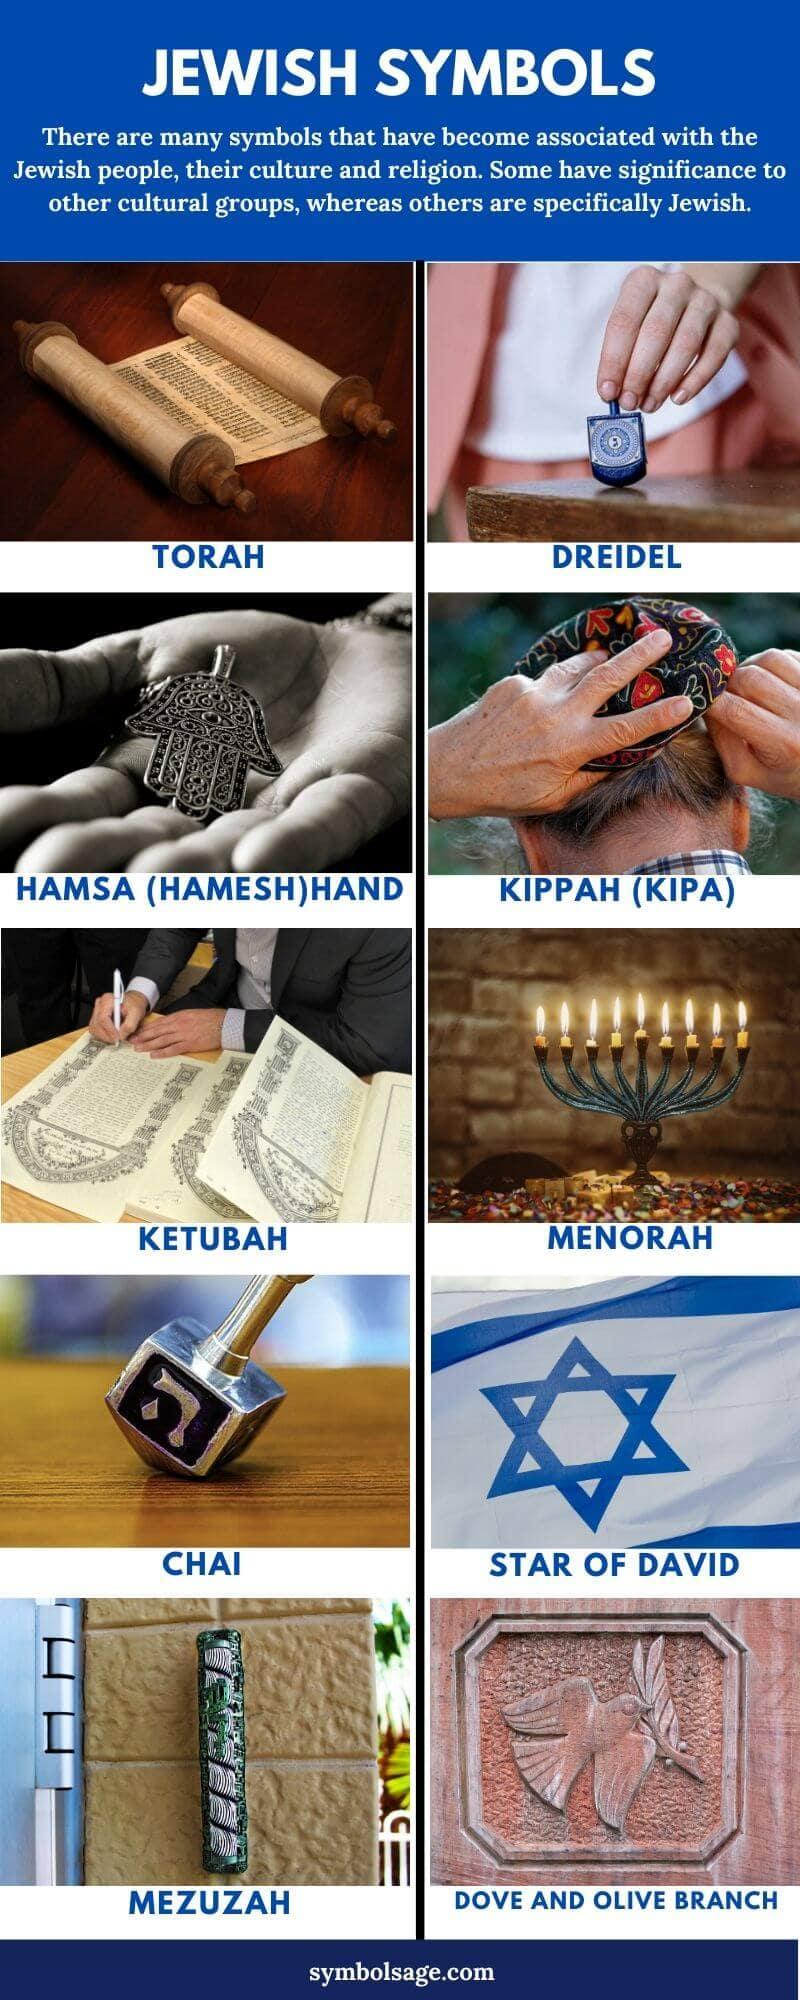 Jewish symbols list infographic